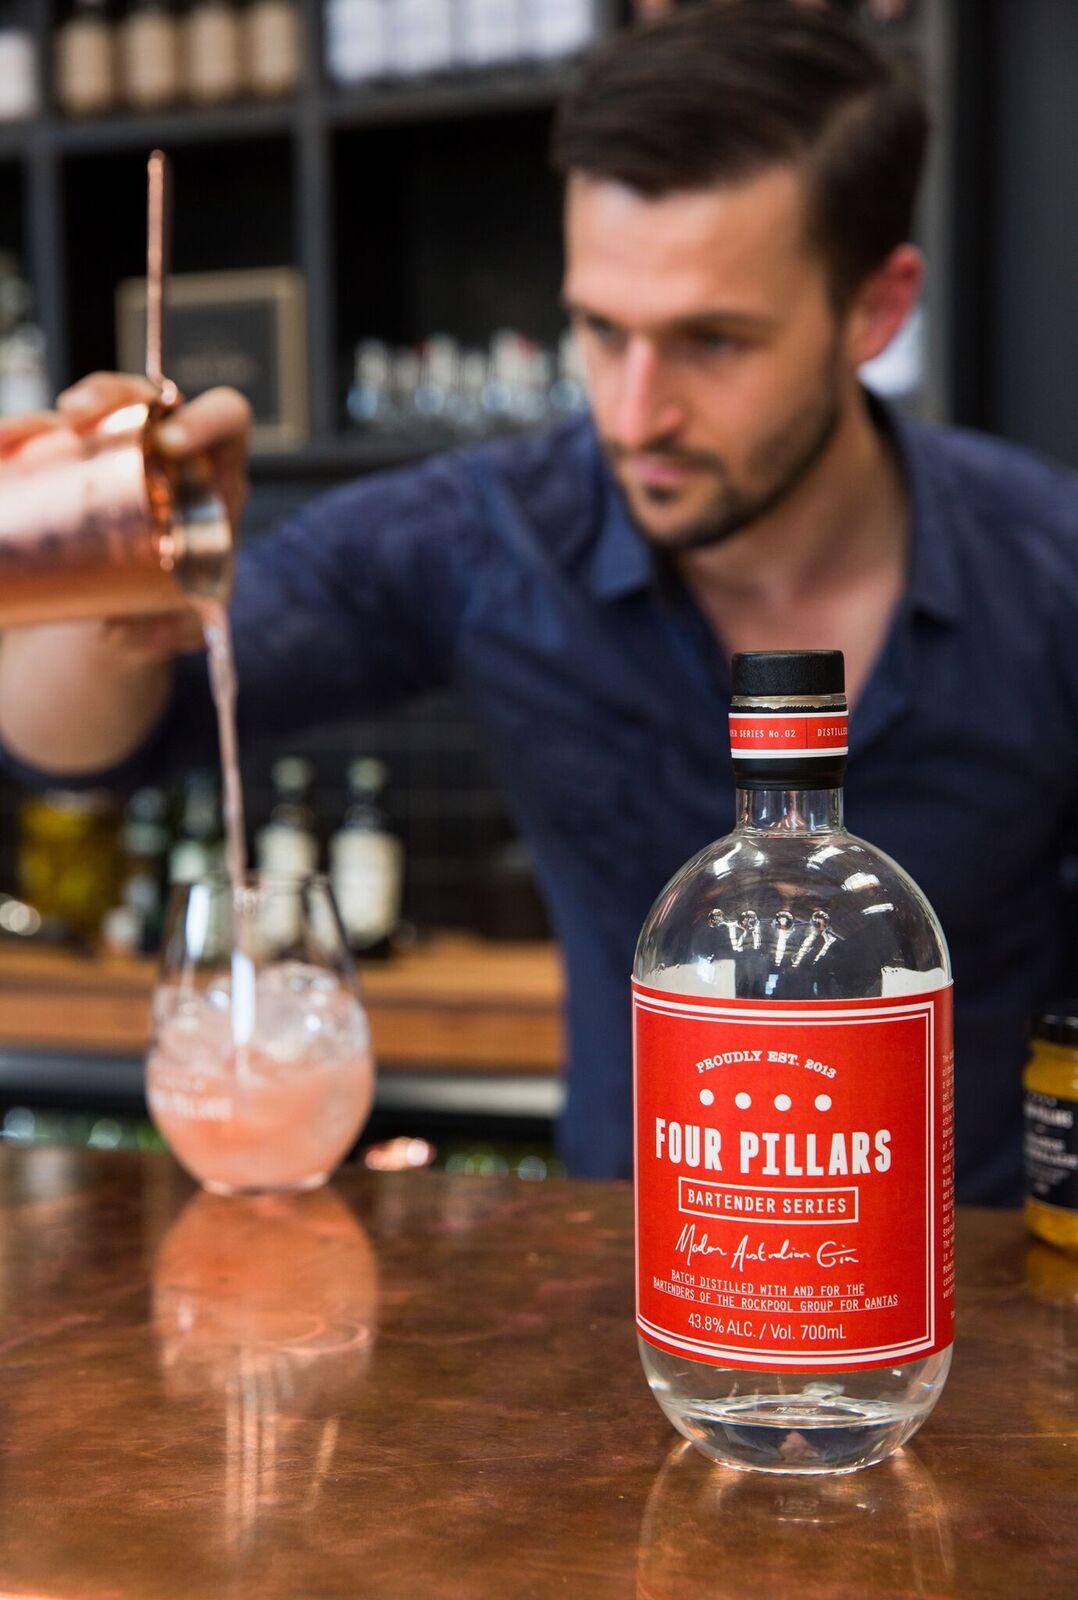 Four Pillars - Modern Australian Gin